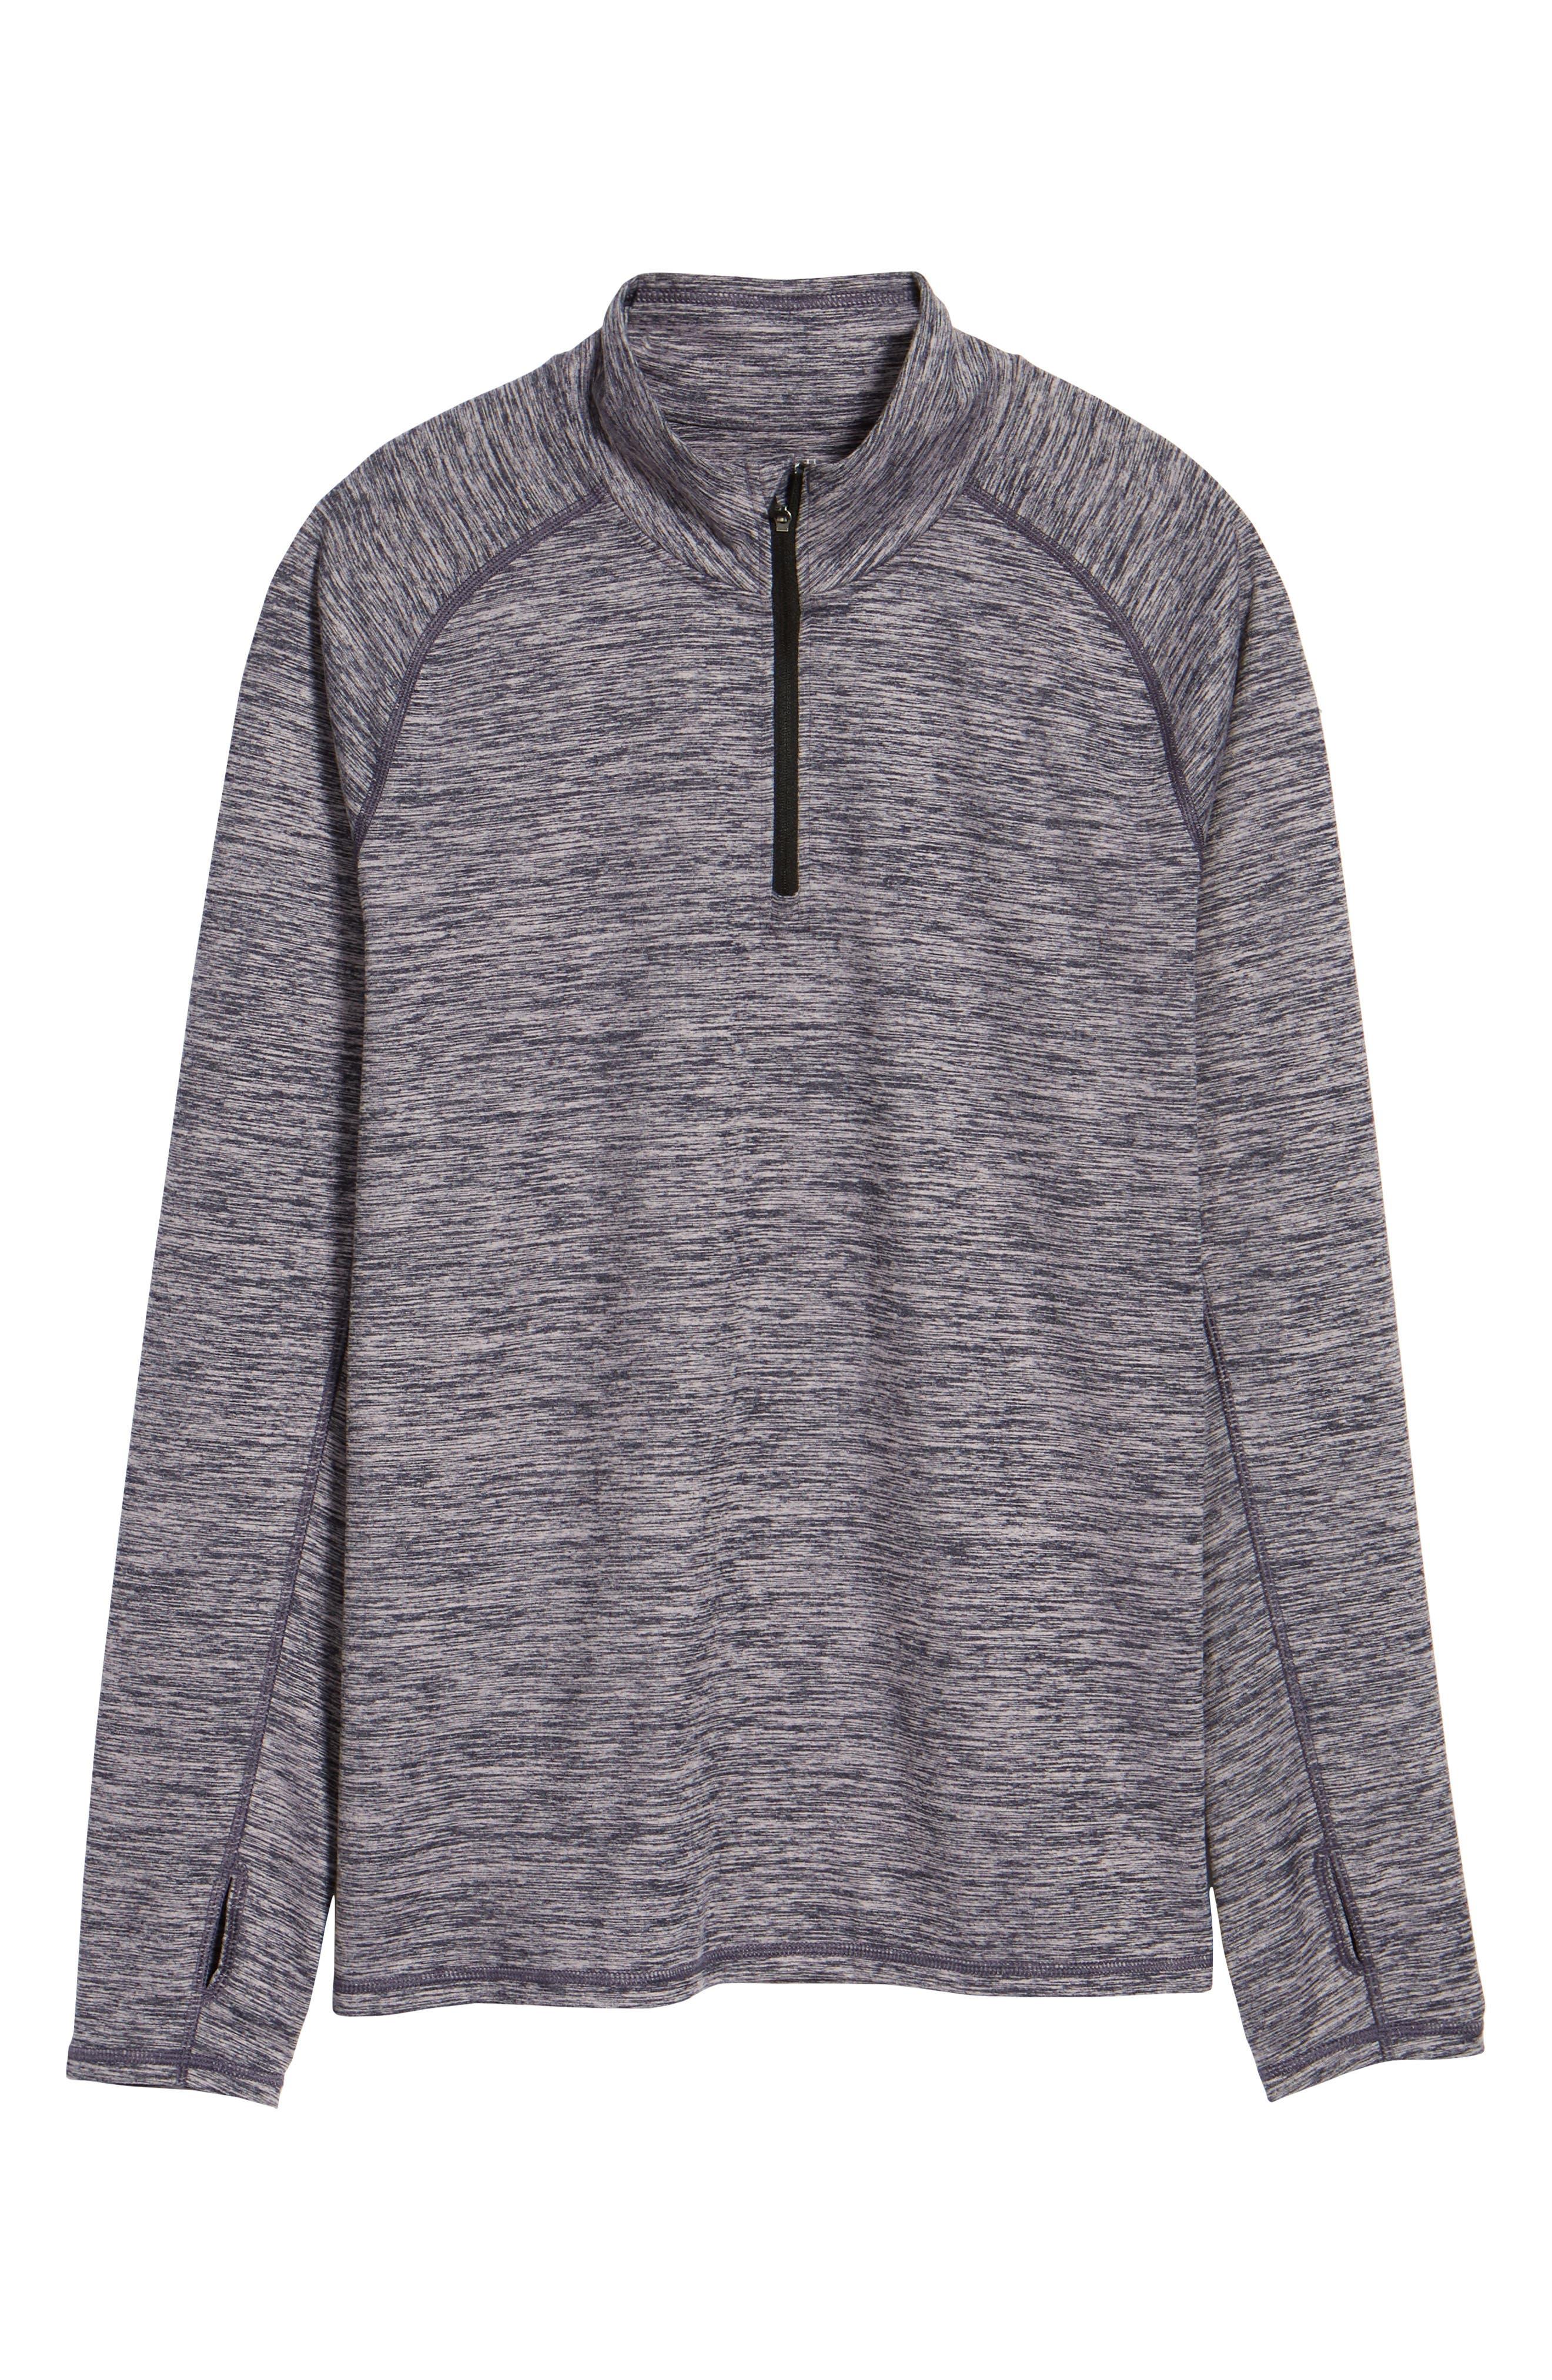 Celsian Quarter Zip Pullover,                             Alternate thumbnail 5, color,                             Purple Navy Melange